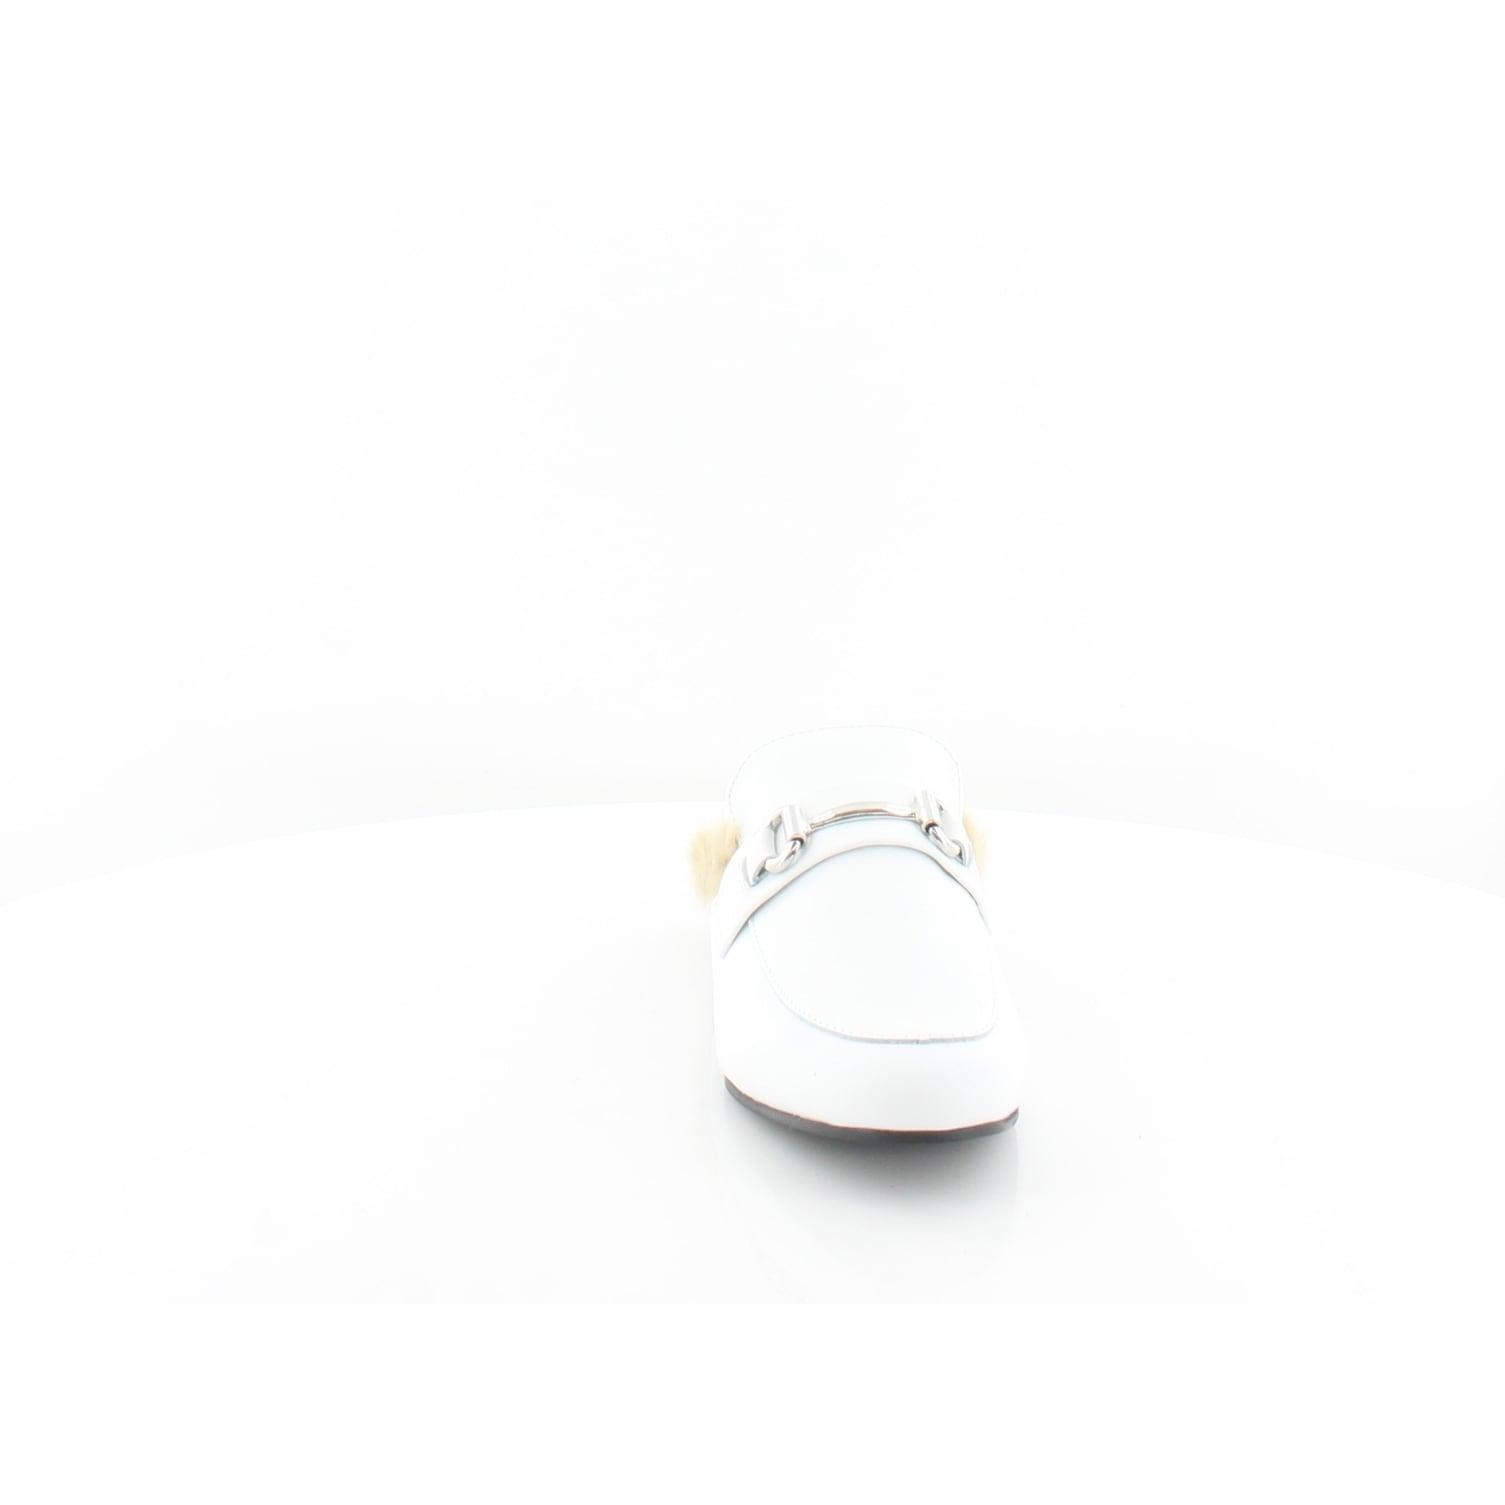 635a228468f Shop Steve Madden Jill Women s FLATS White - Free Shipping Today -  Overstock - 25735926